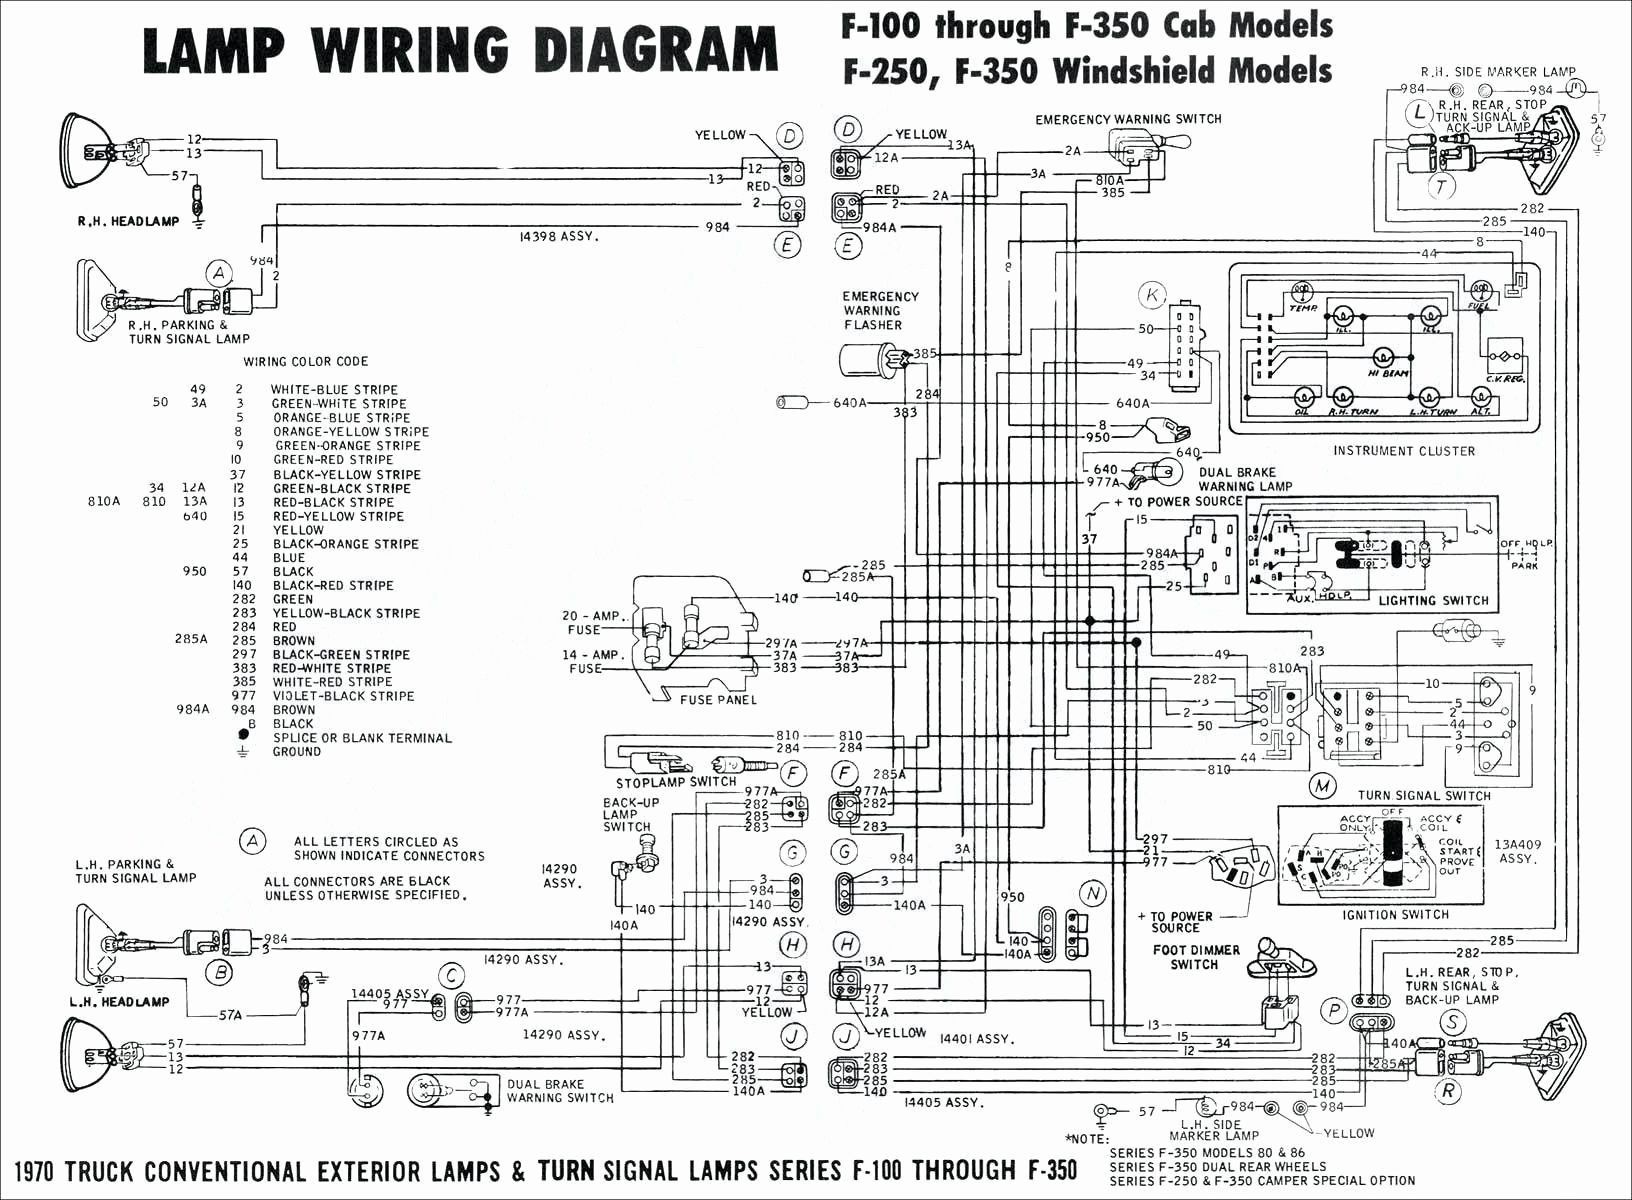 2000 S10 Taillight Wiring 2000 Chevy S10 Headlight Wiring Diagram Wiring Diagram Of 2000 S10 Taillight Wiring